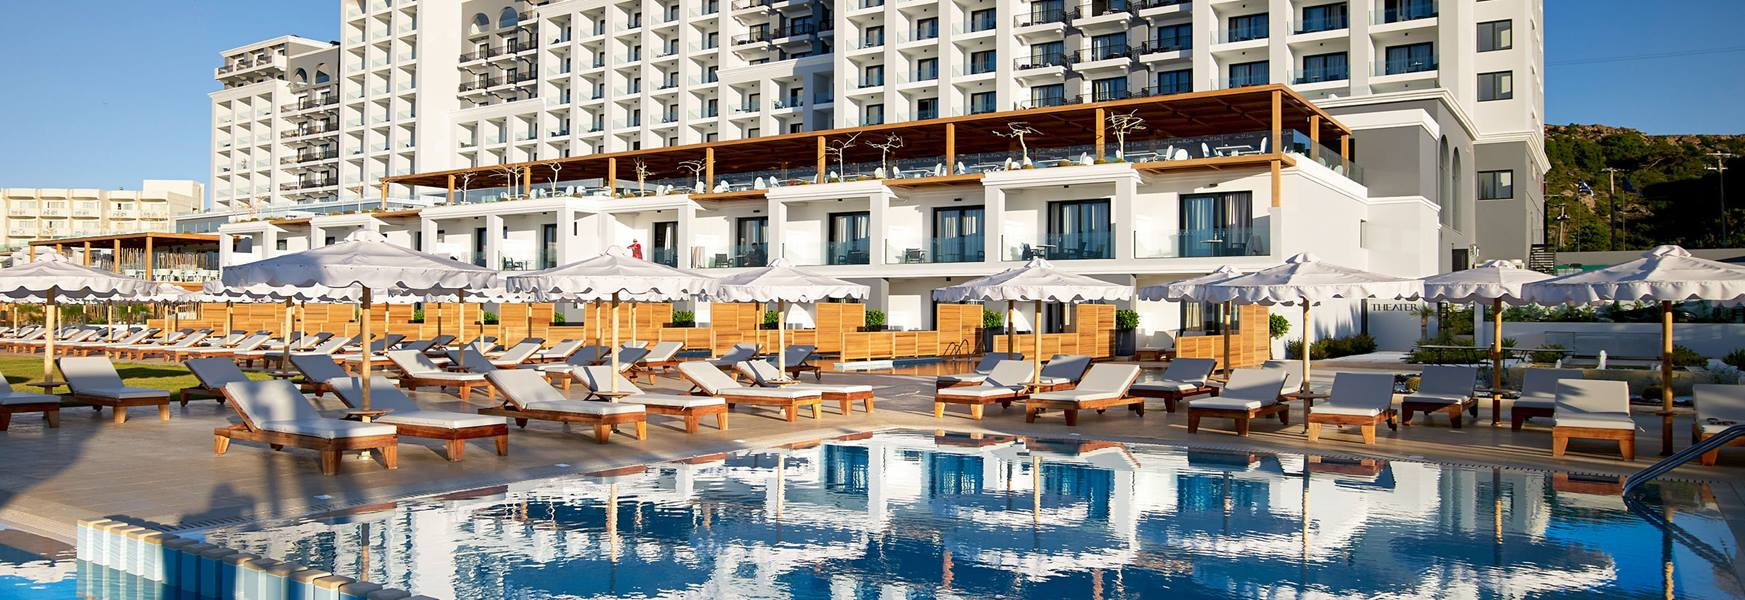 Hotel Mitsis Alia Resort, Faliraki, Rodos